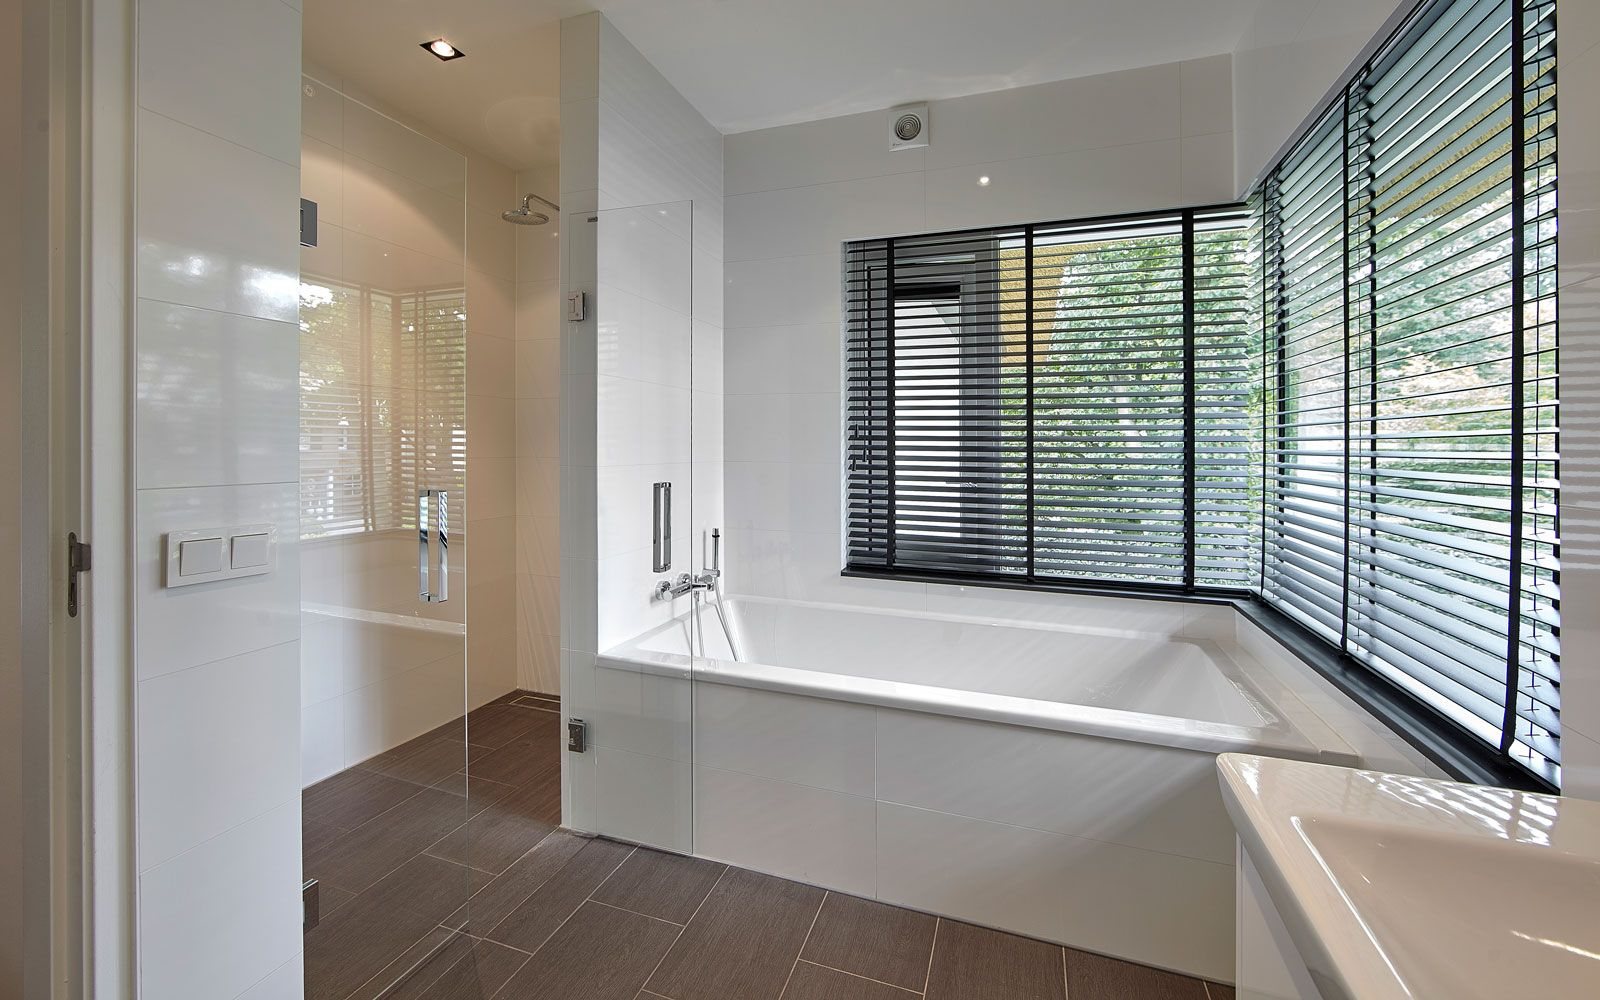 Strak-modern | Bobs, Design projects and Villas